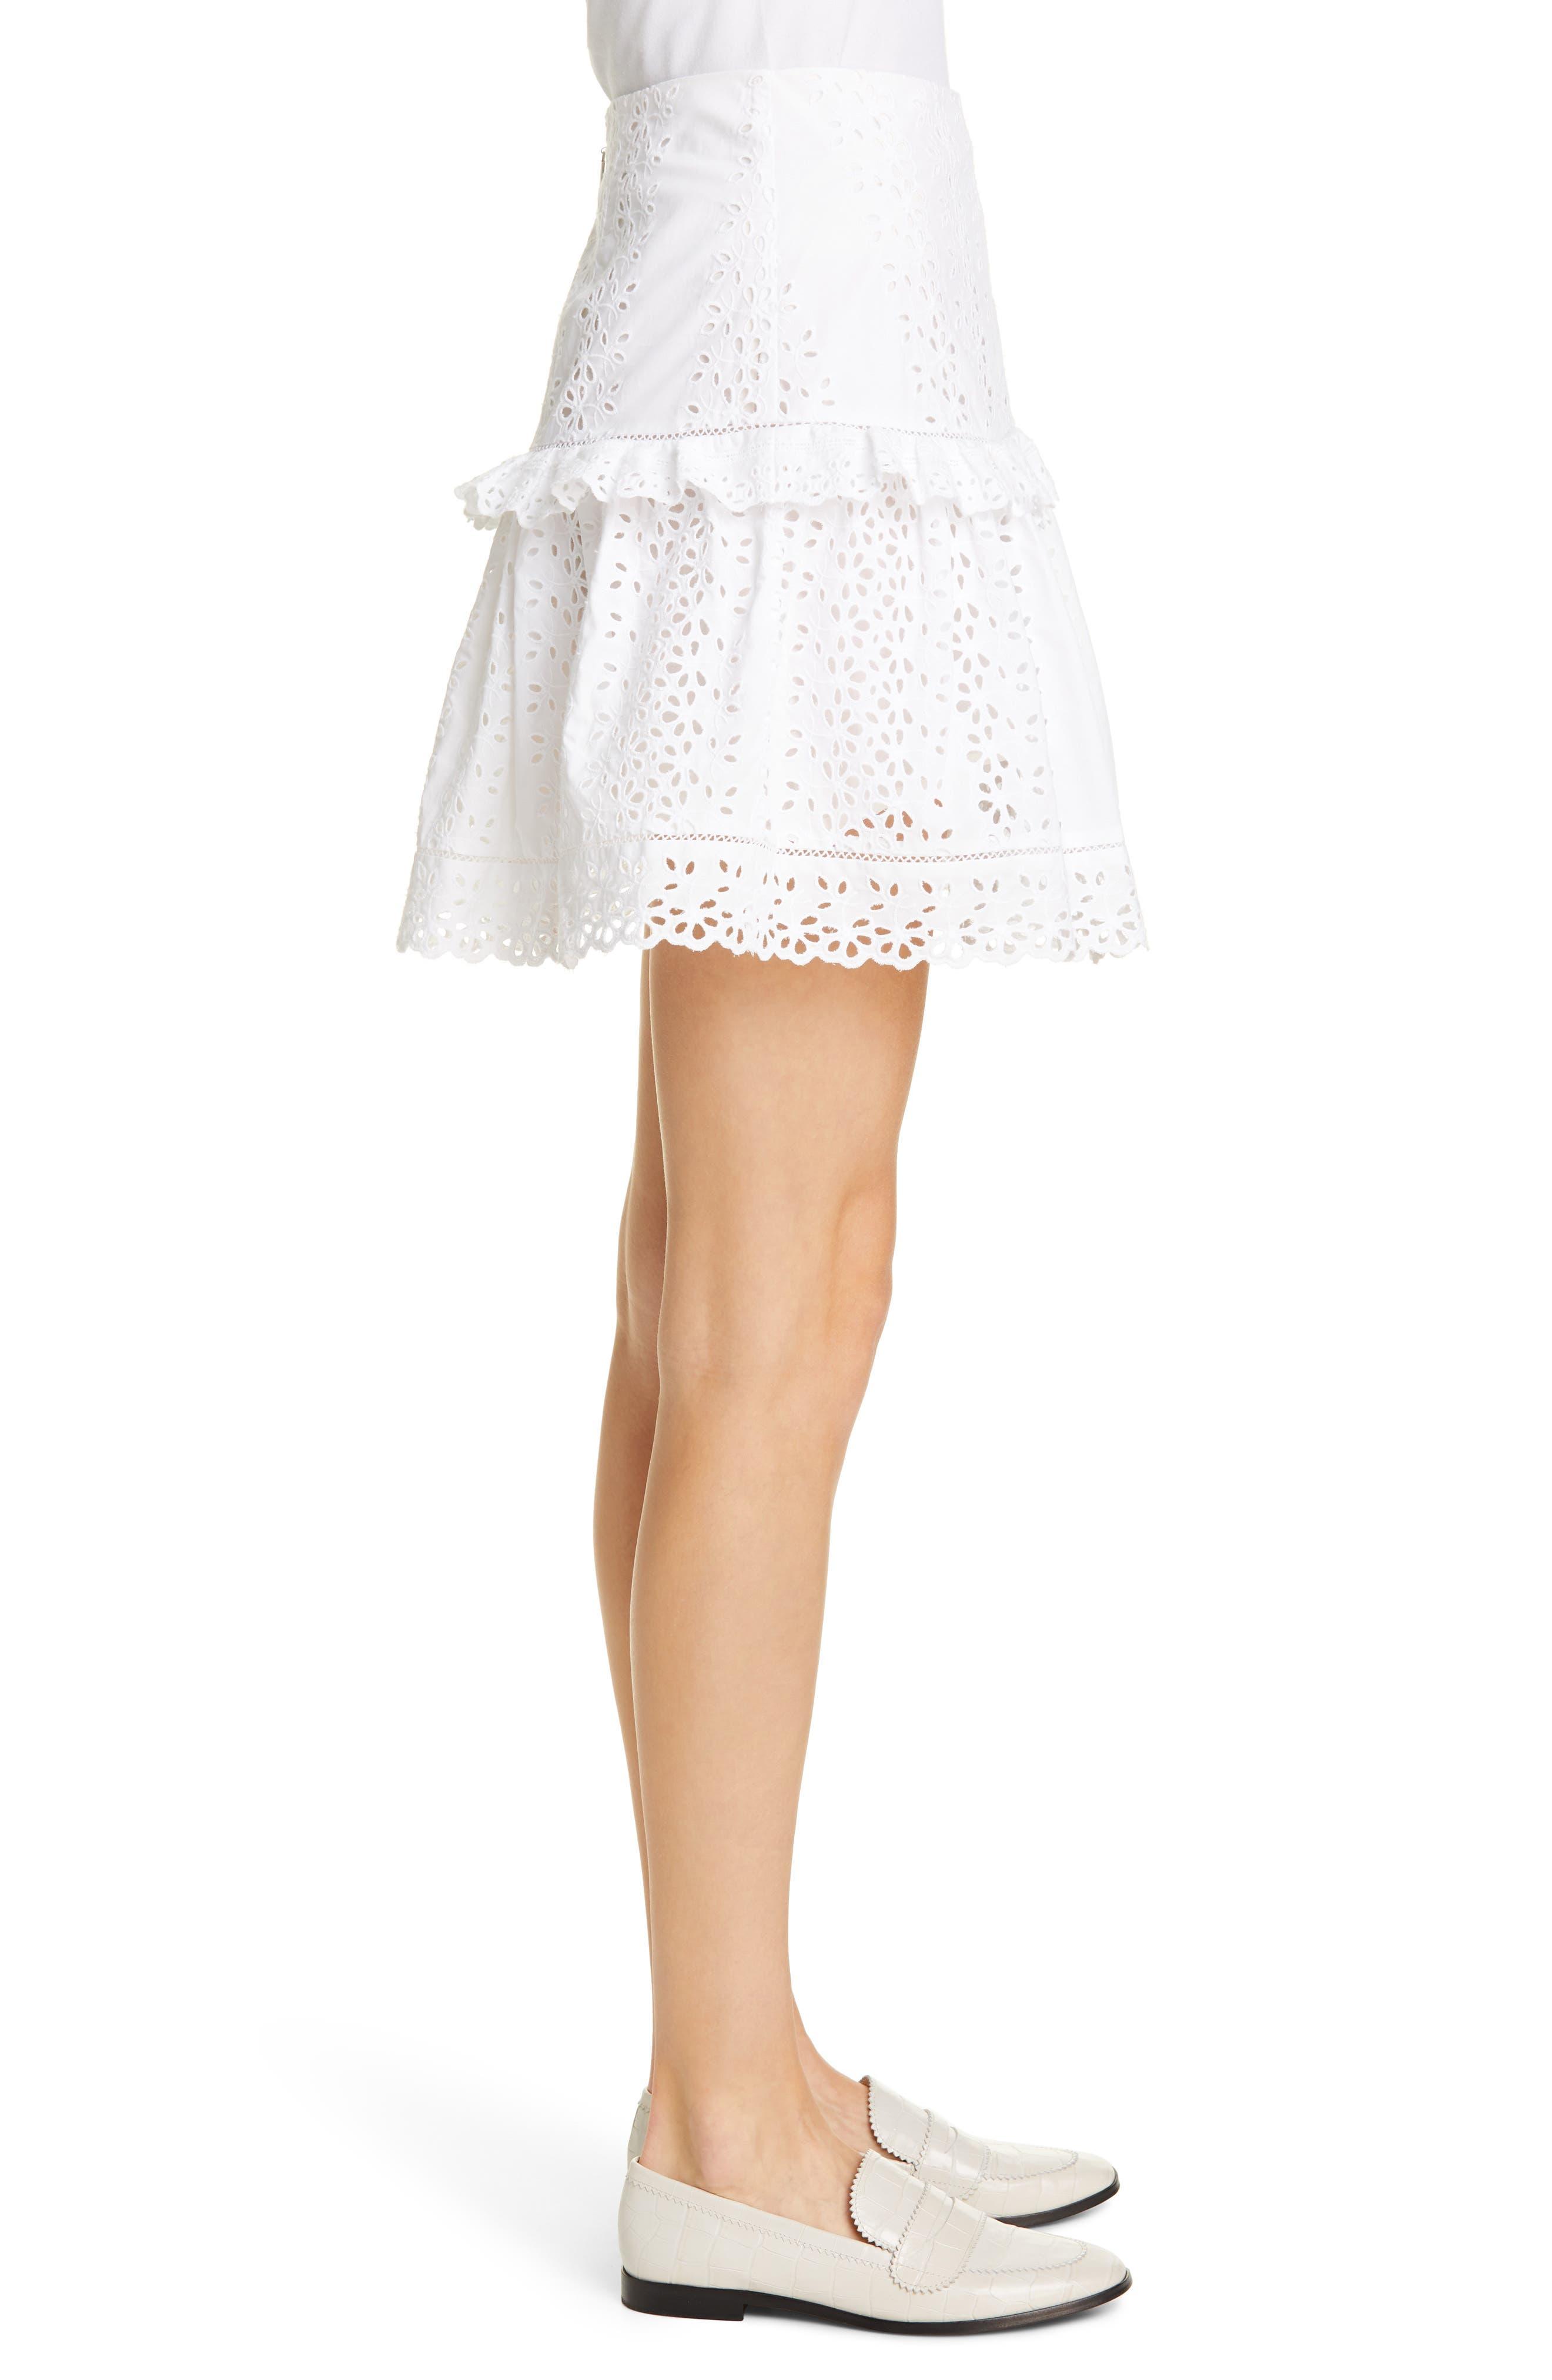 REBECCA TAYLOR, Karina Cotton Eyelet Skirt, Alternate thumbnail 3, color, MILK